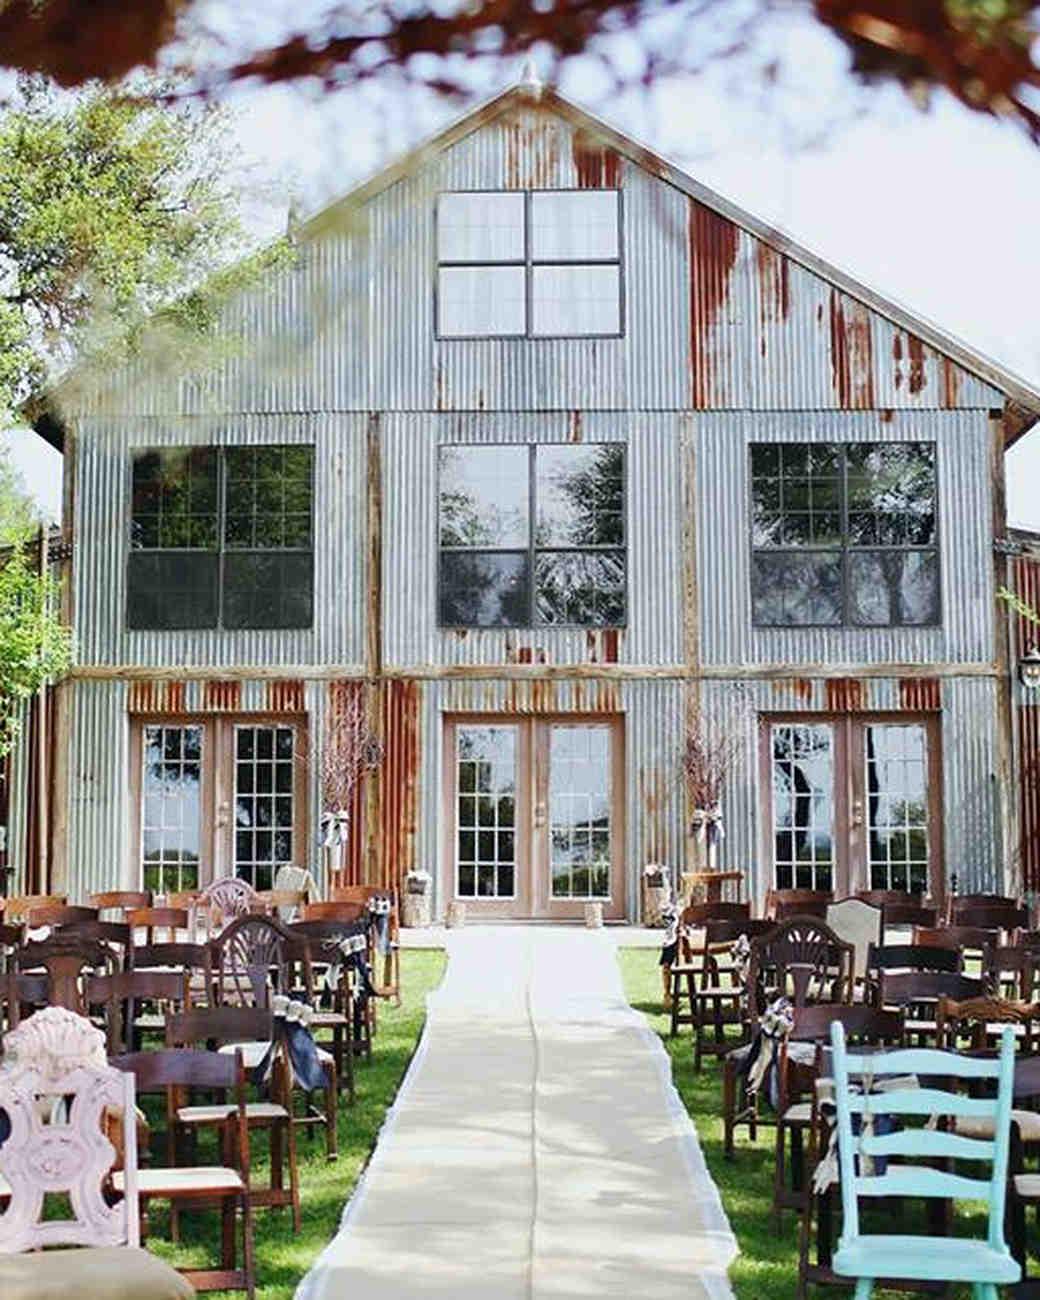 11 Rustic Wedding Venues To Book For Your Big Day Martha Stewart Weddings: Vintage Barn Wedding Venue At Websimilar.org